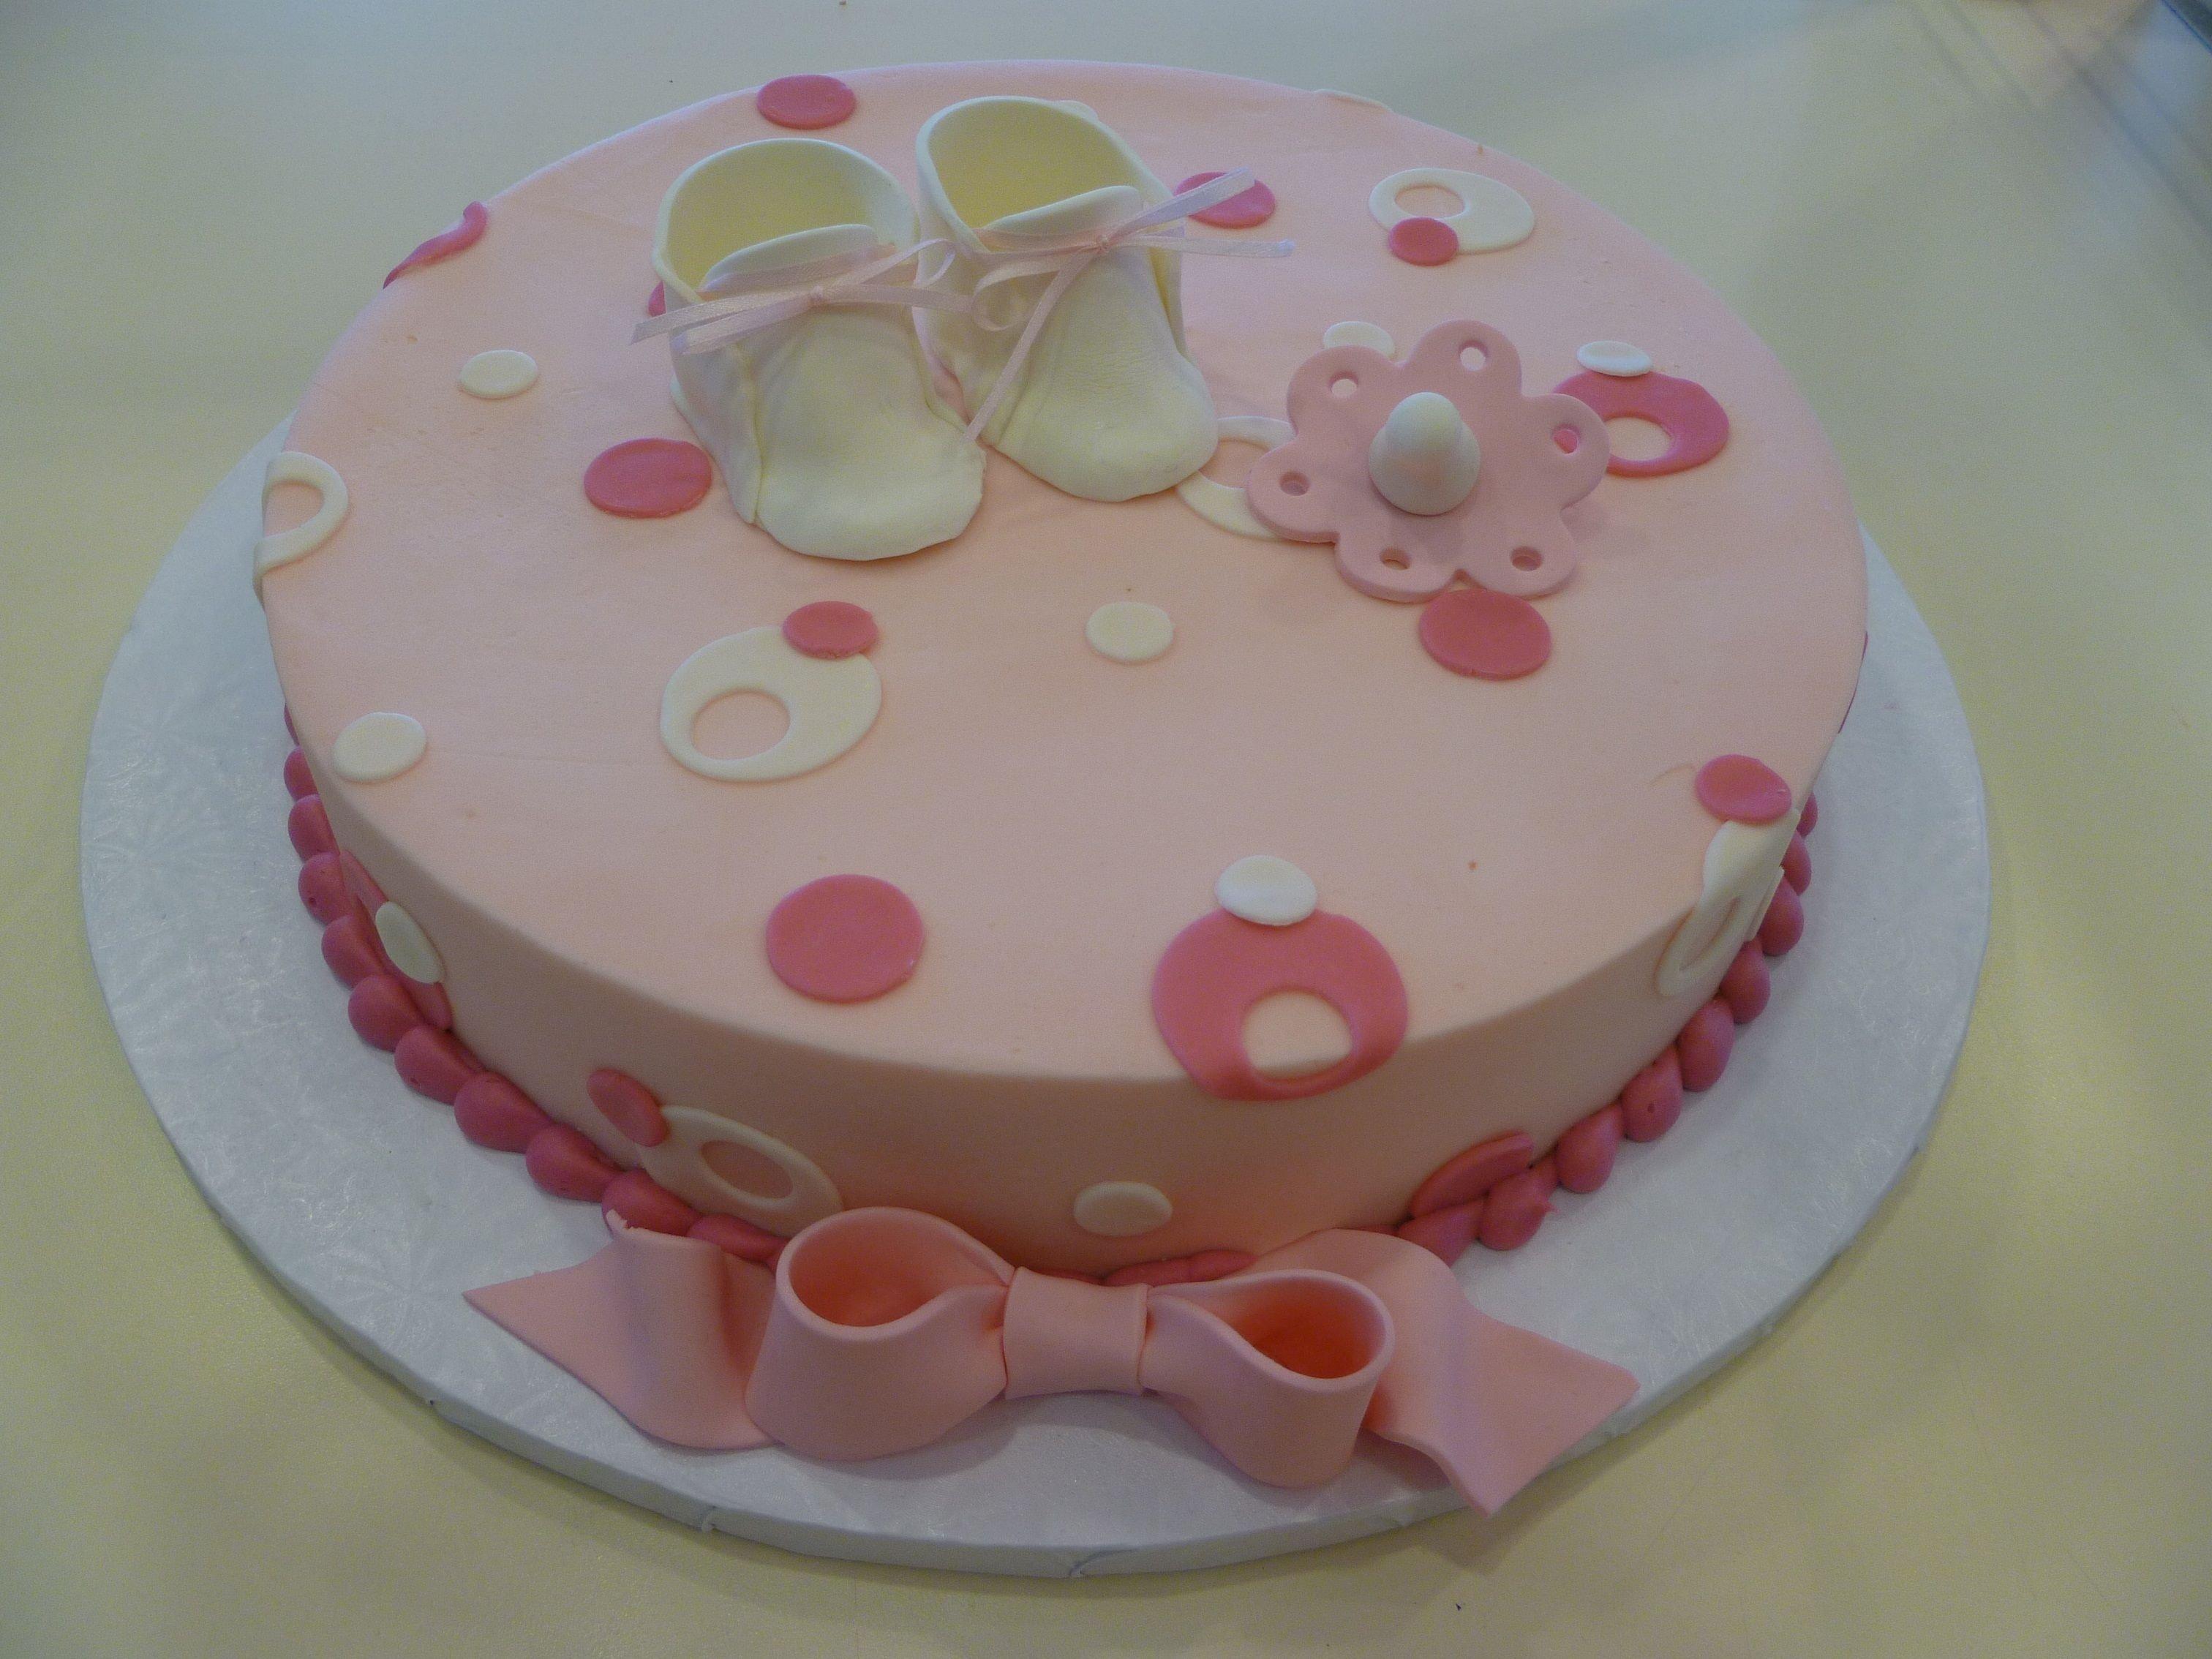 10 Perfect Baby Girl Shower Cake Ideas girls baby shower cakes booties baby shower cake for girl outta 1 2020